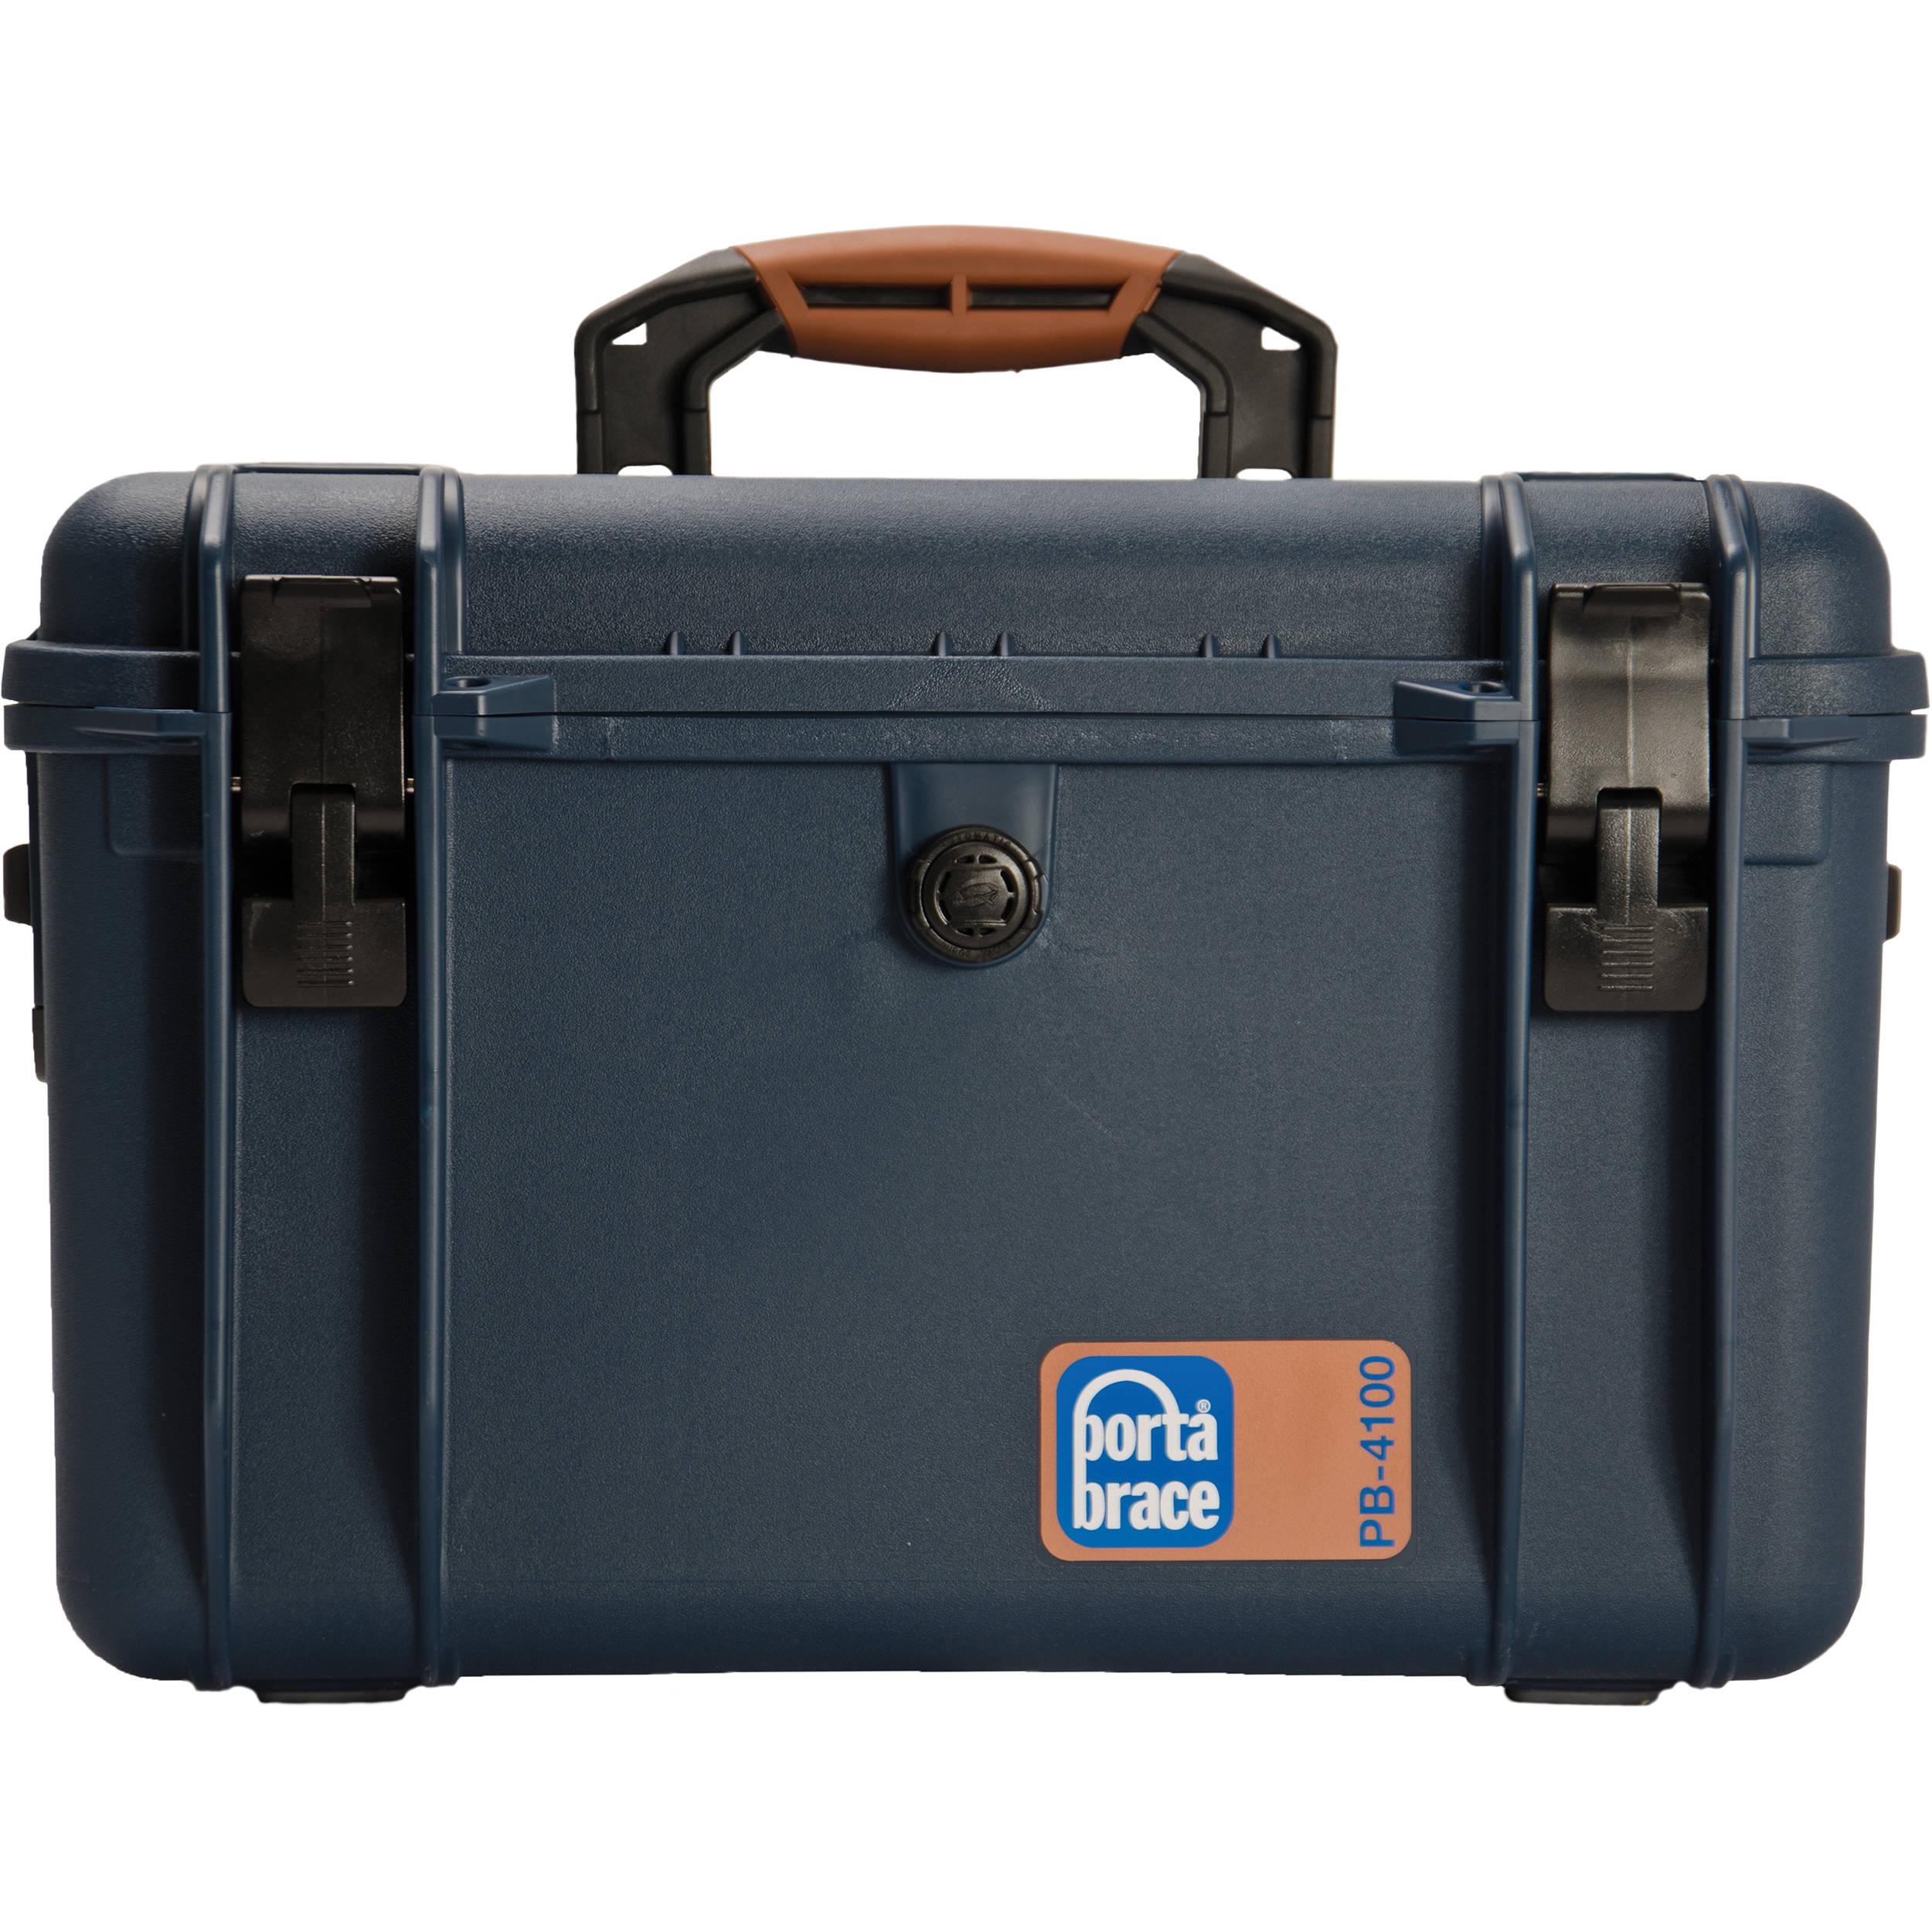 Https C Product 816271 Reg Handle Hand Grip Handgrip Ninja Rr R Original Porta Brace Pb 4100e Hard Production Case 841263